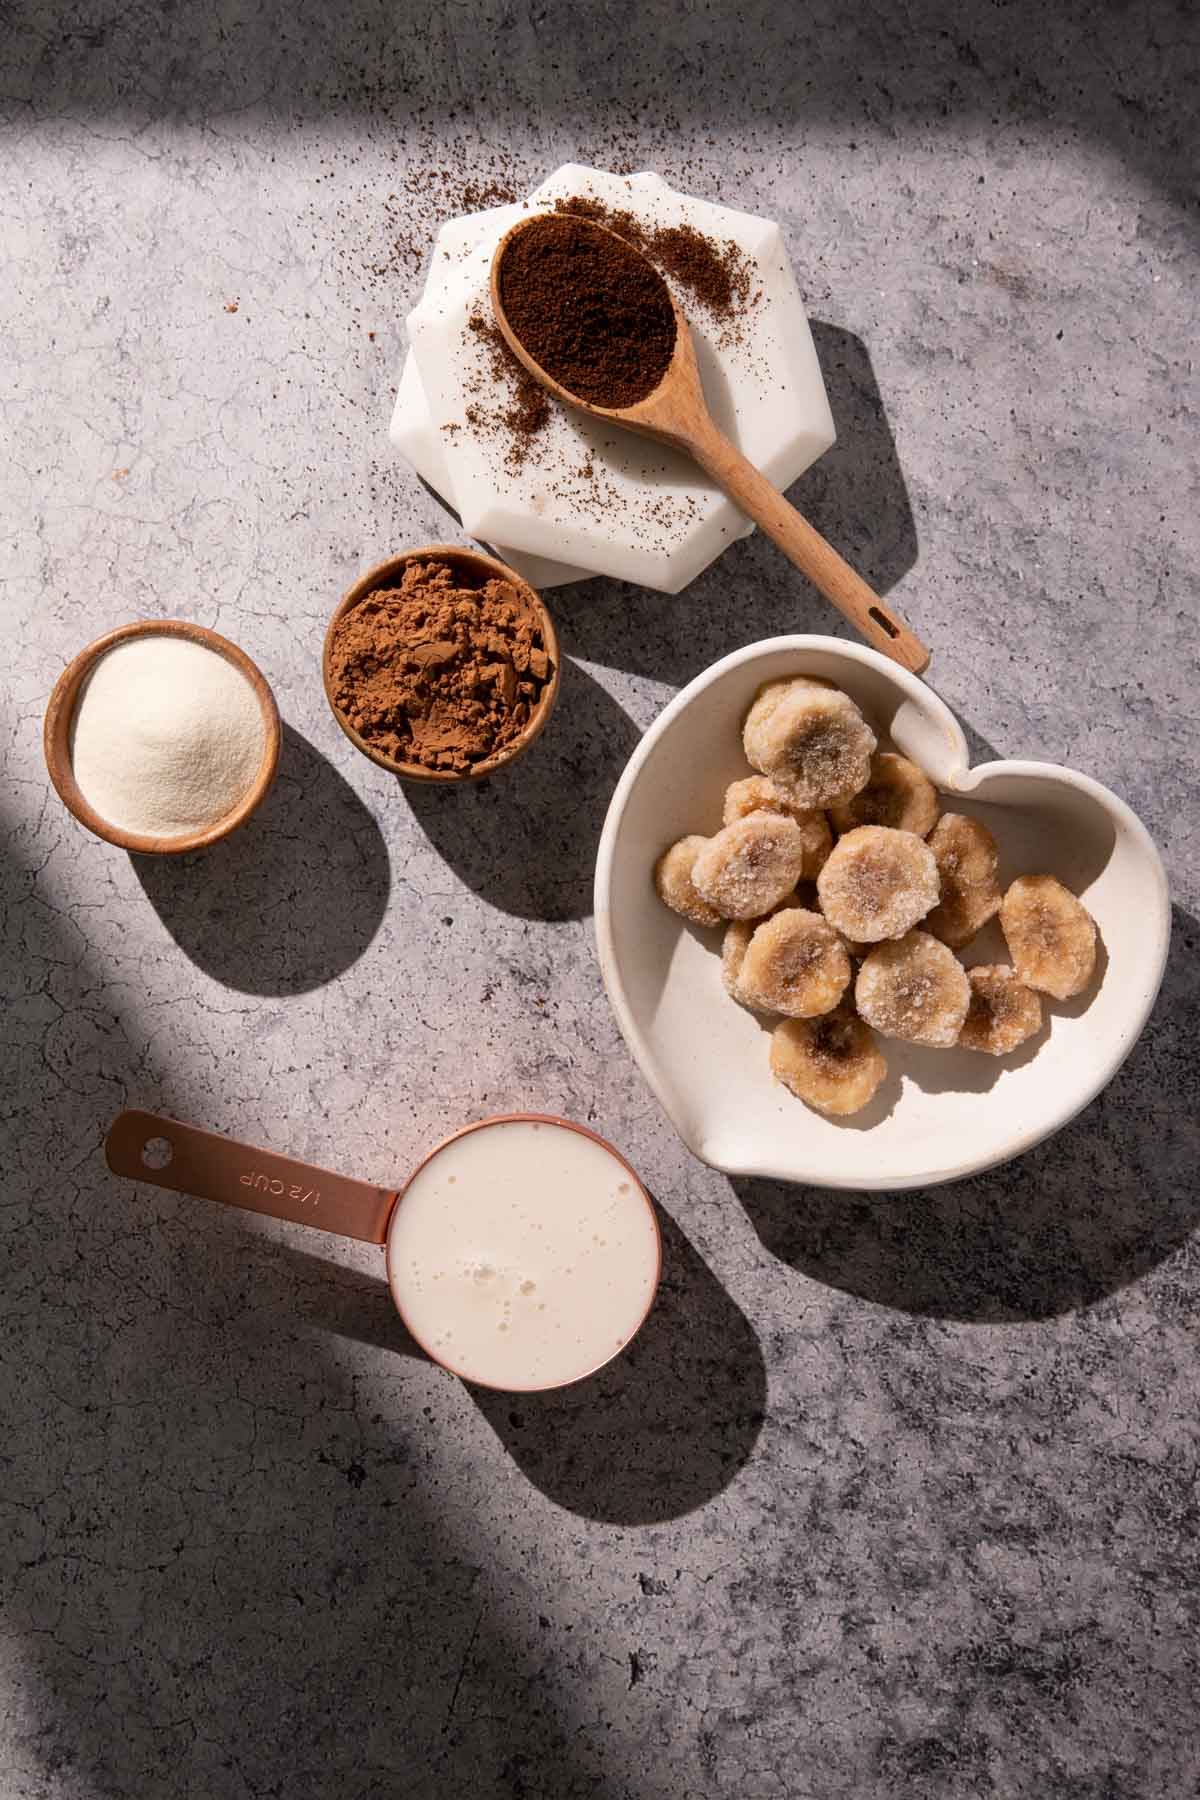 A bowl of frozen bananas, milk, collagen powder, and cocoa powder